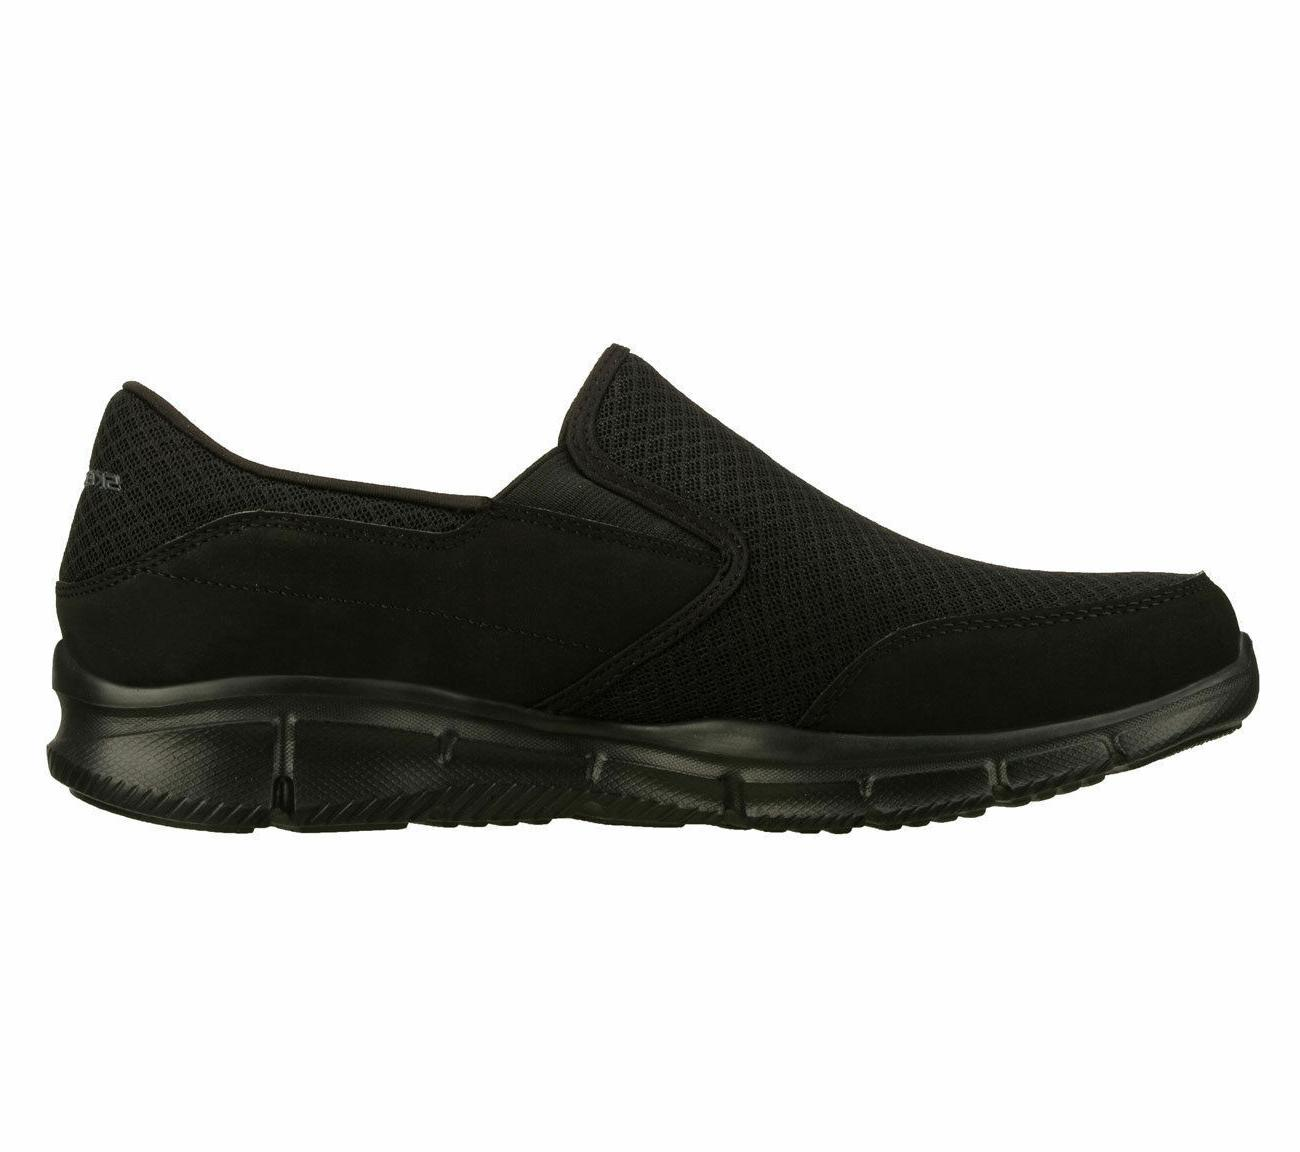 Memory Shoes Men's Slip Dress Casual Loafer